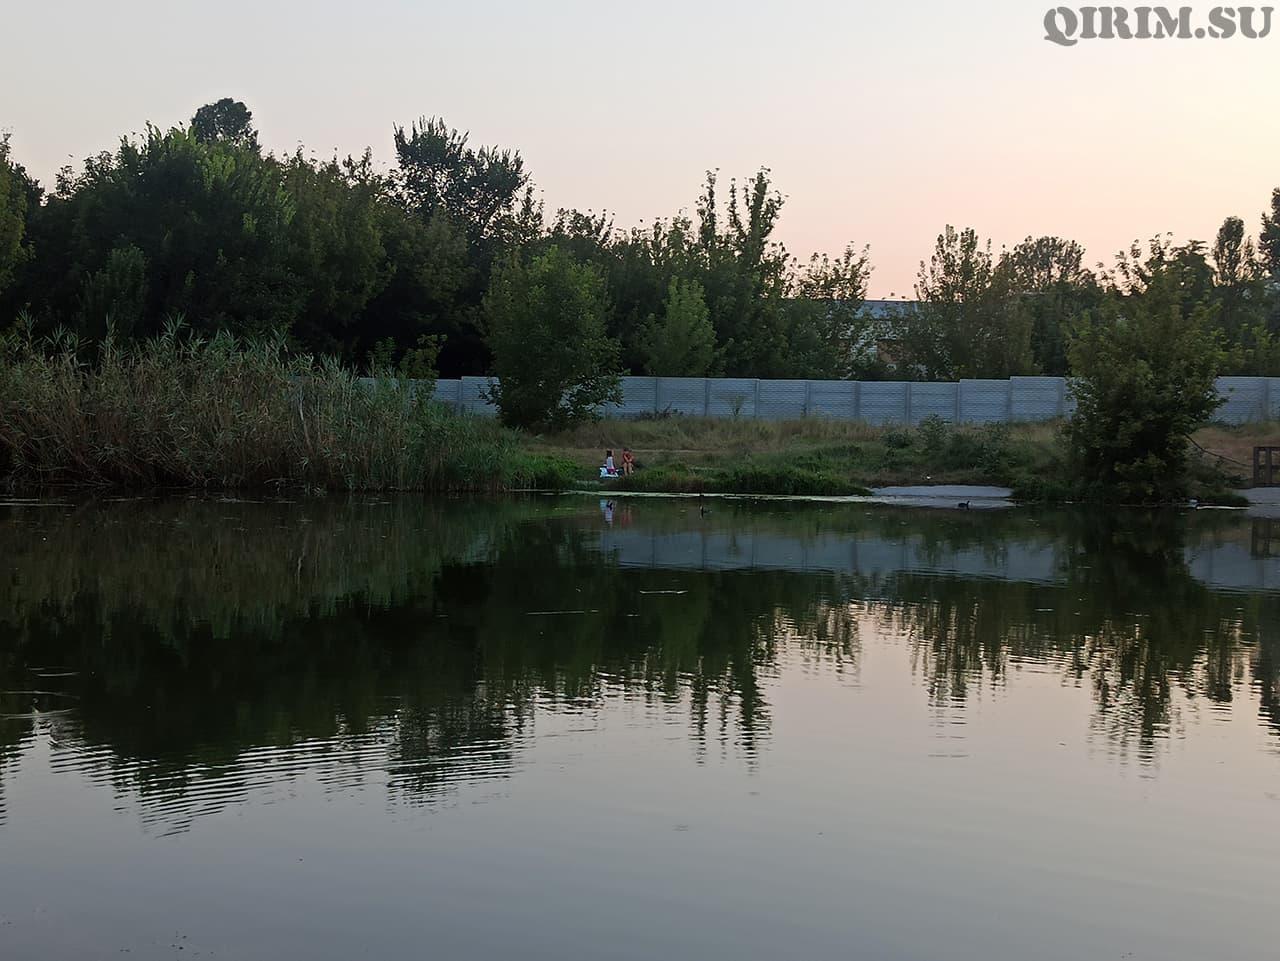 пикники на озере в районе радиорынка